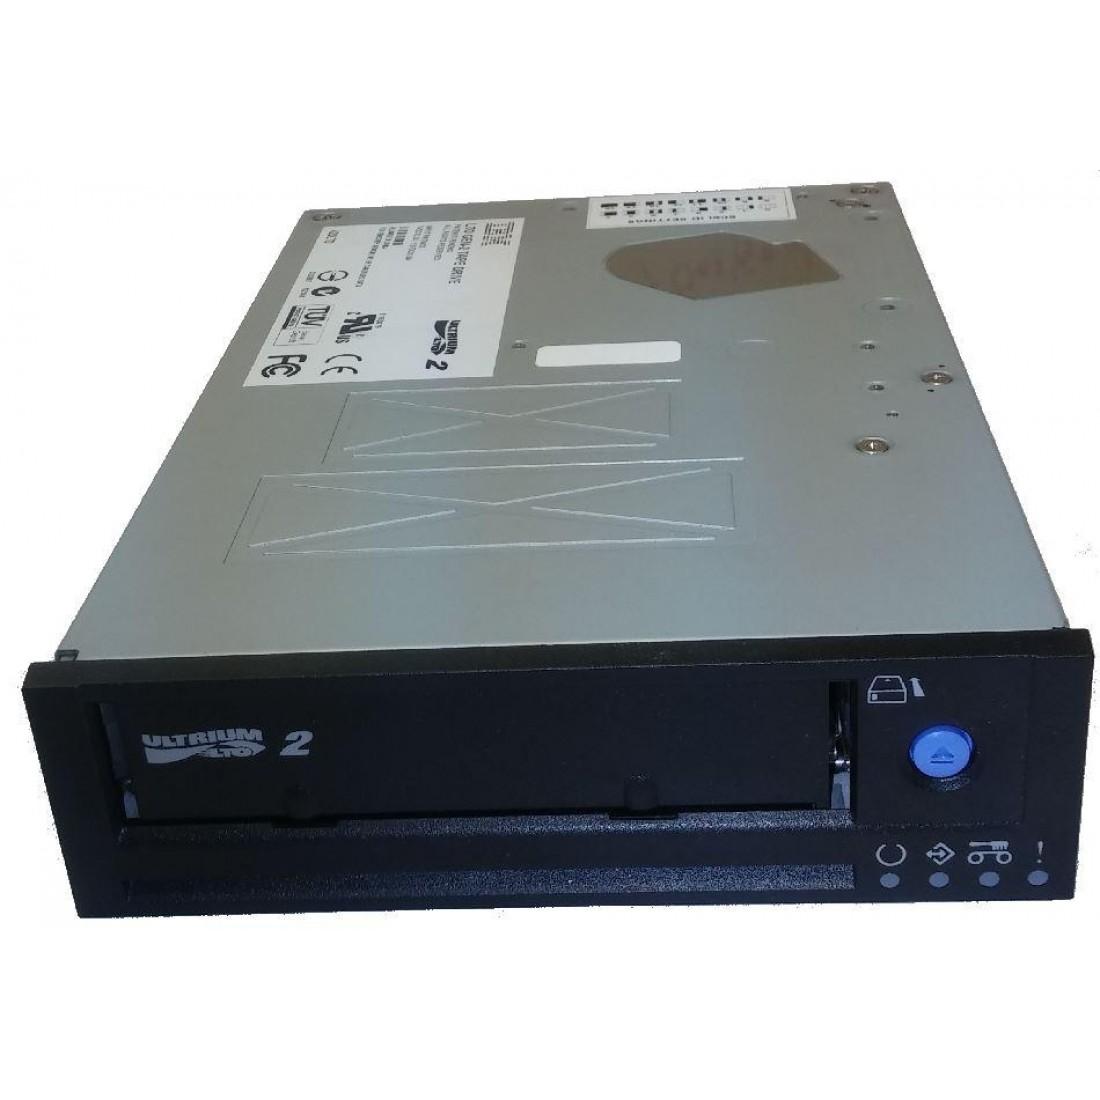 5755 200 GB 1 2 Inch LTO Tape Half Height